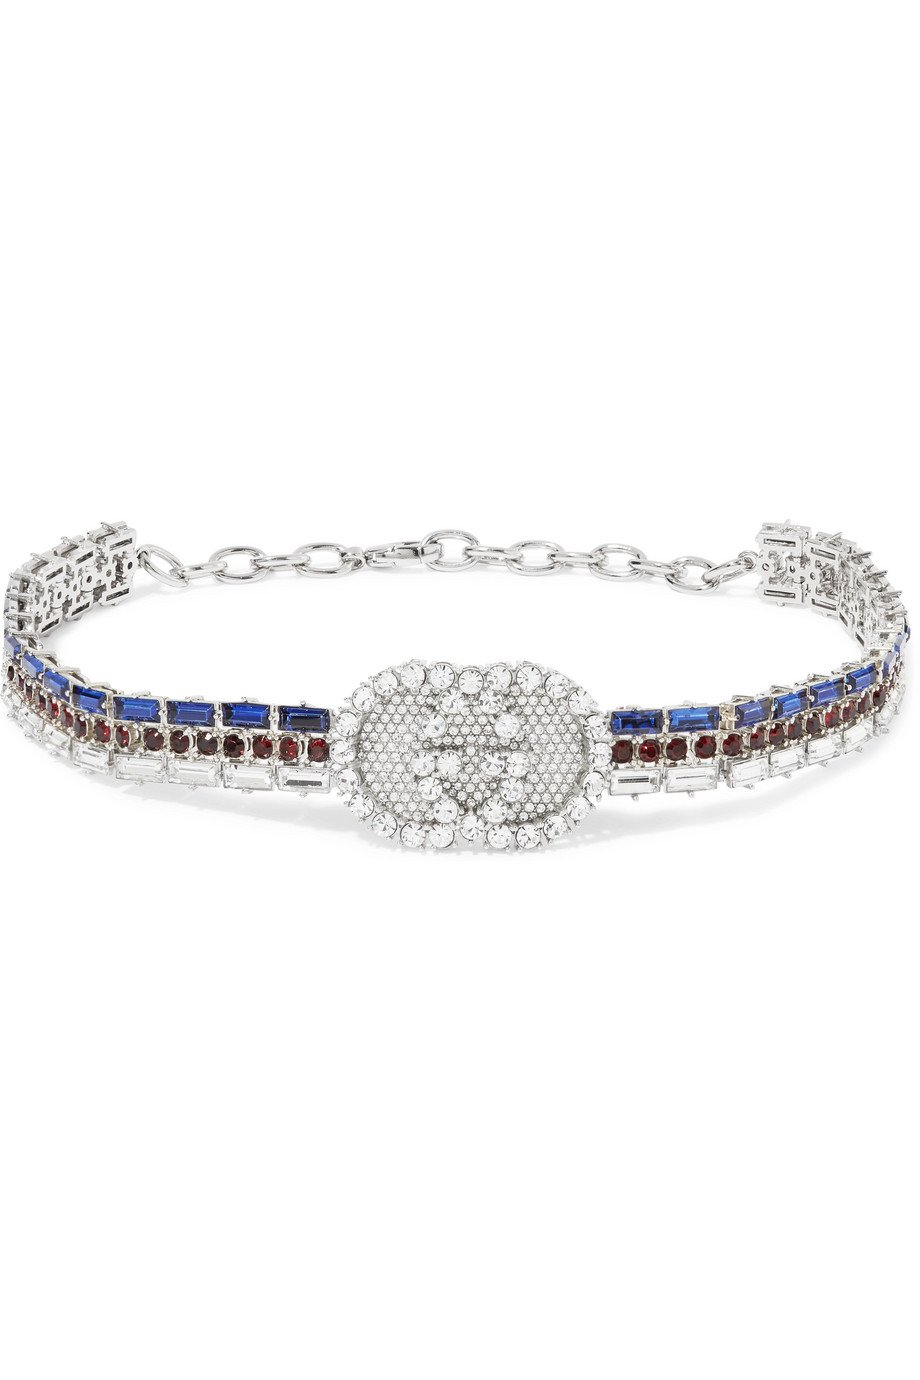 Gucci | Silver-plated crystal choker | NET-A-PORTER.COM